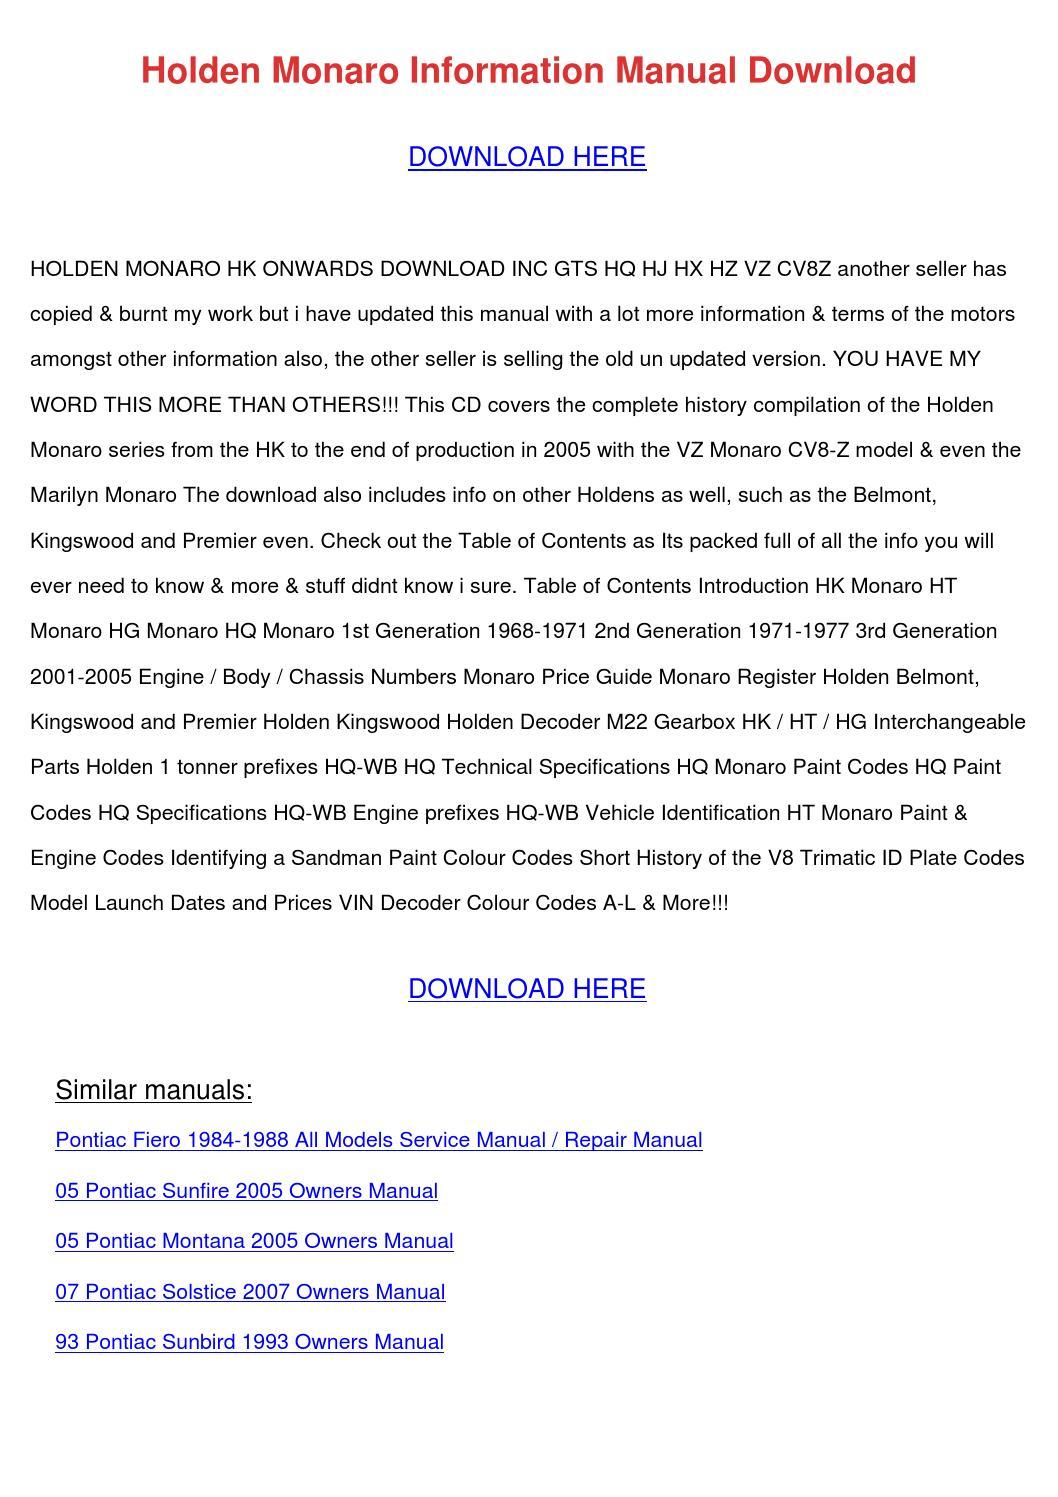 Holden Monaro Information Manual Download by HarleyFreeland - issuu